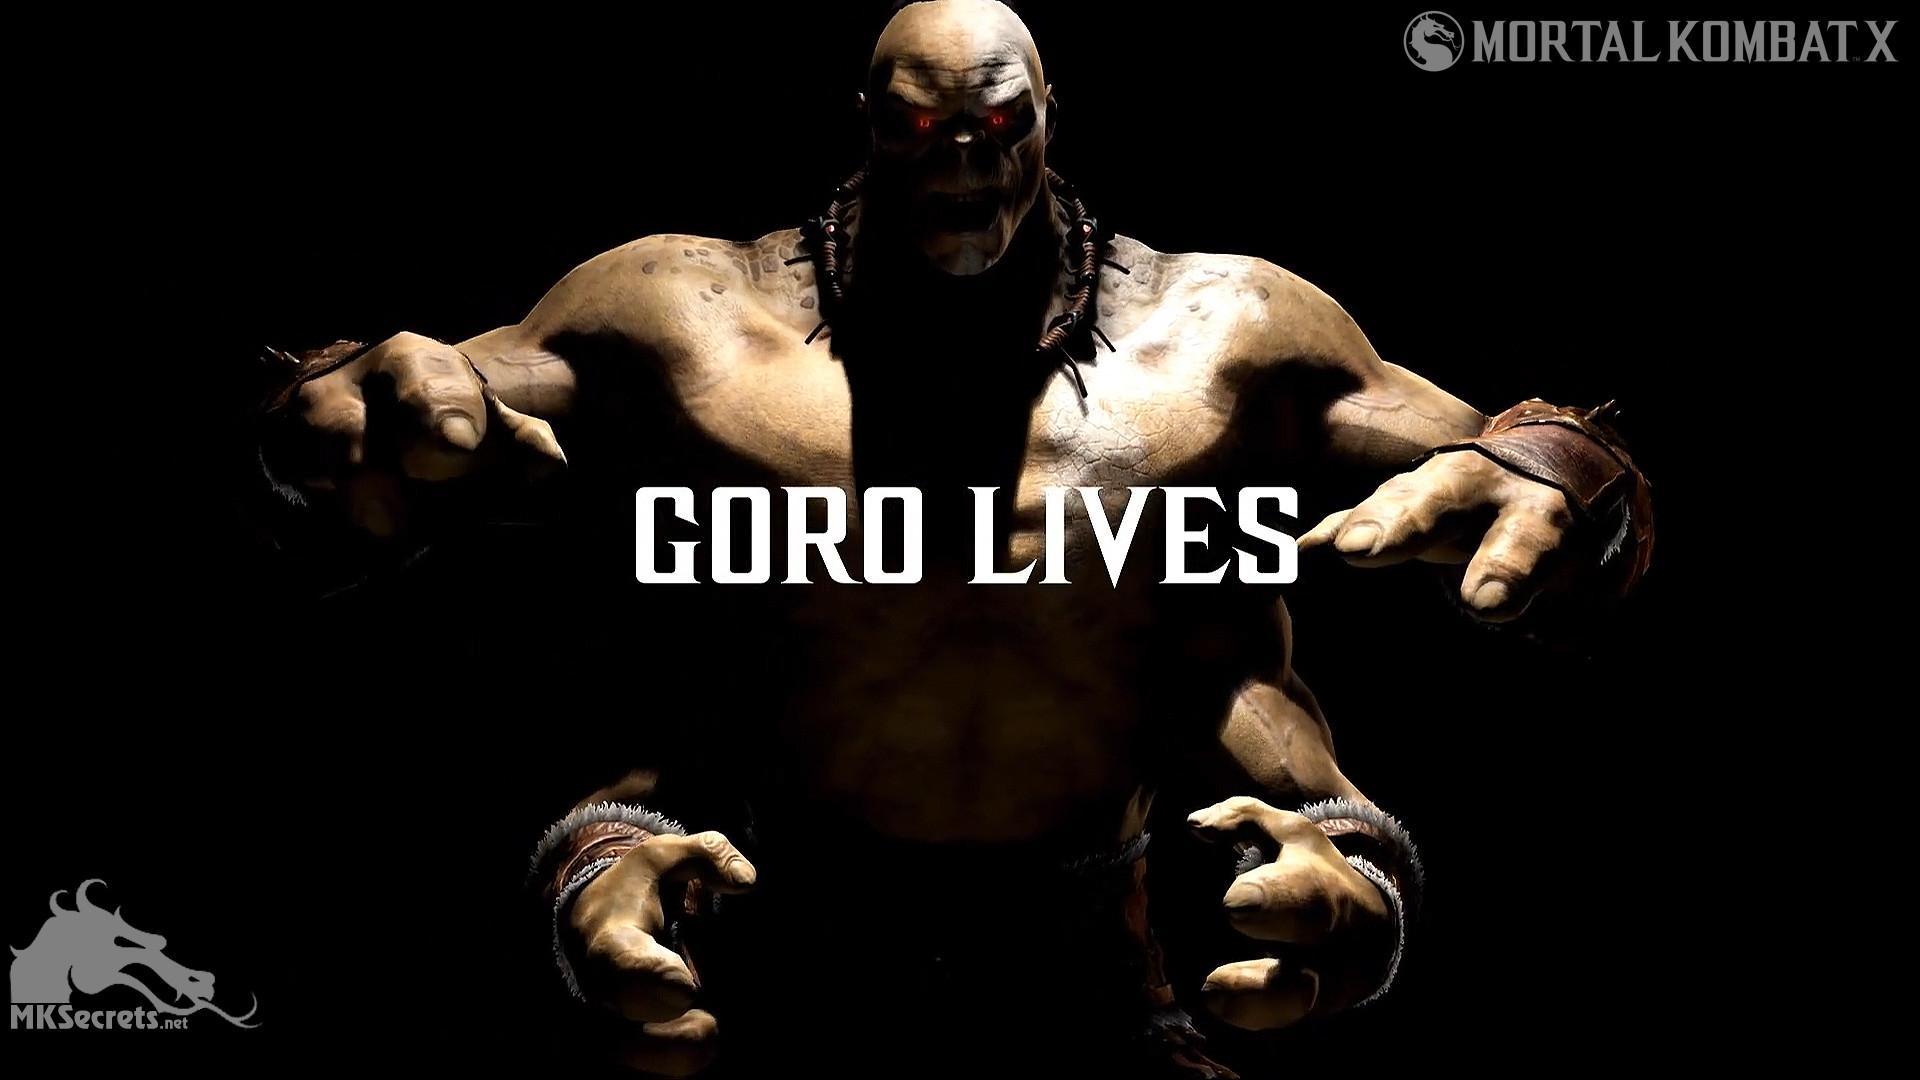 Mortal Kombat X Goro Lives Wallpaper